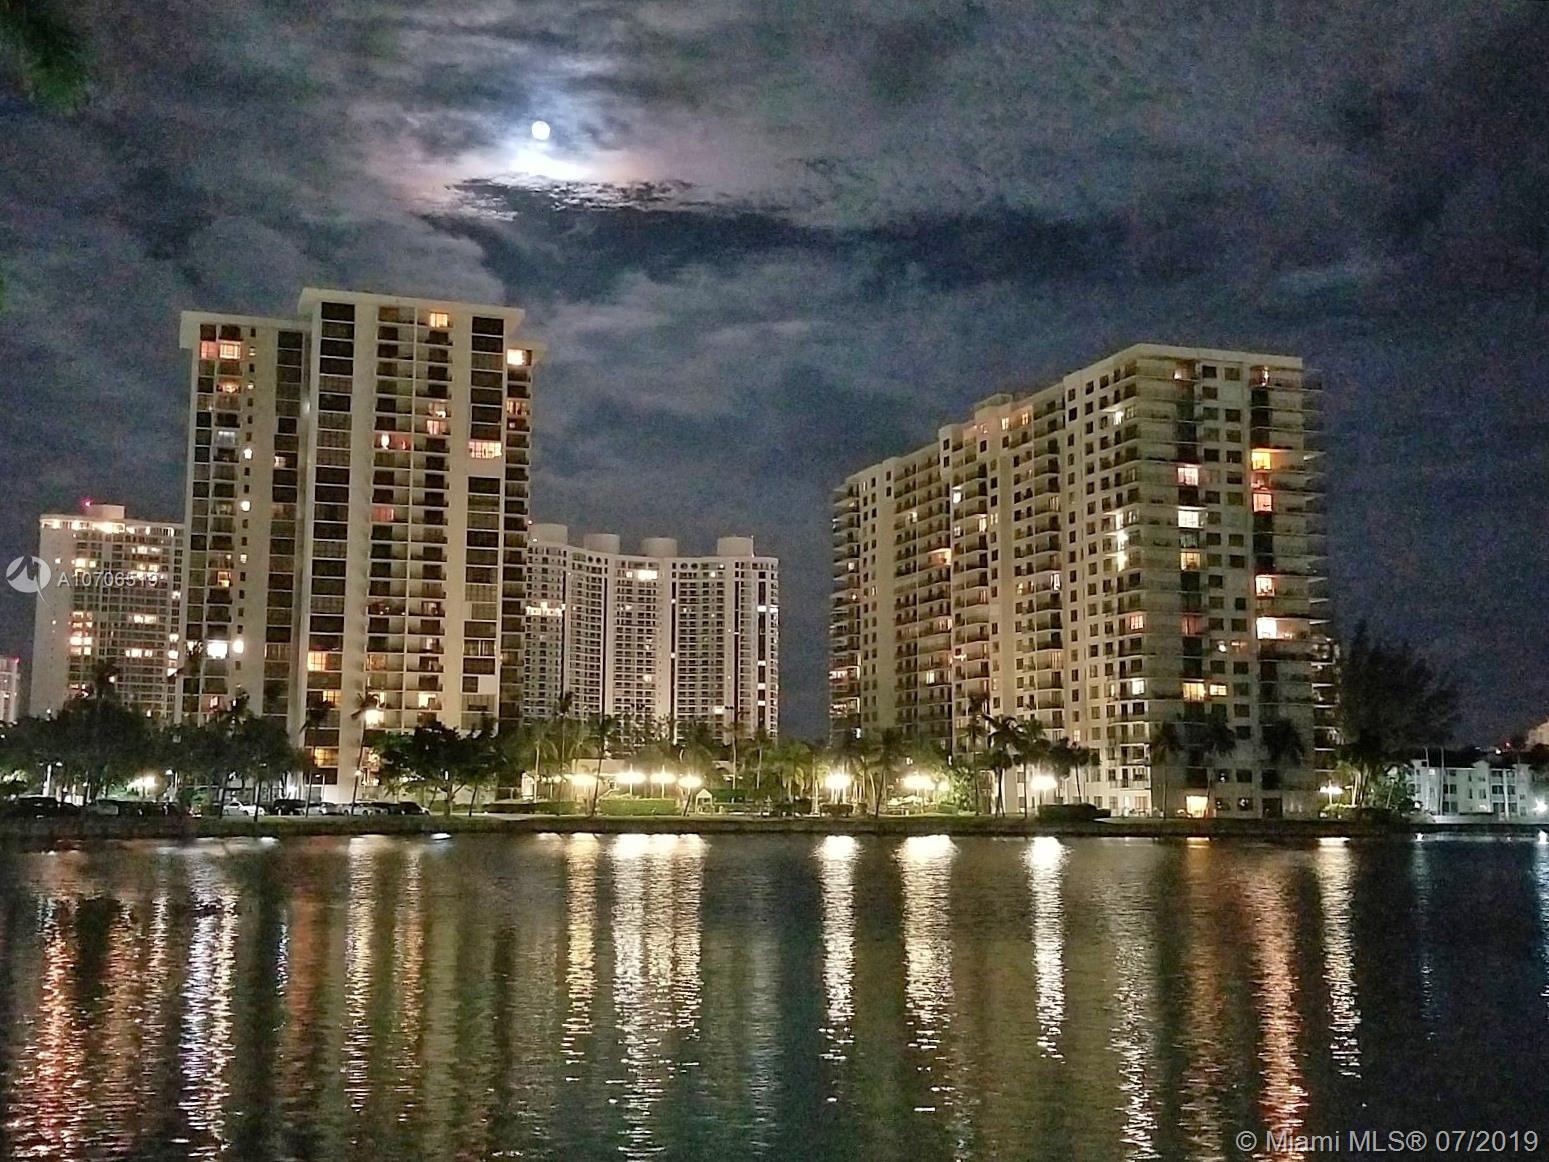 18181 NE 31st Ct #808, Aventura, FL 33160 - Aventura, FL real estate listing